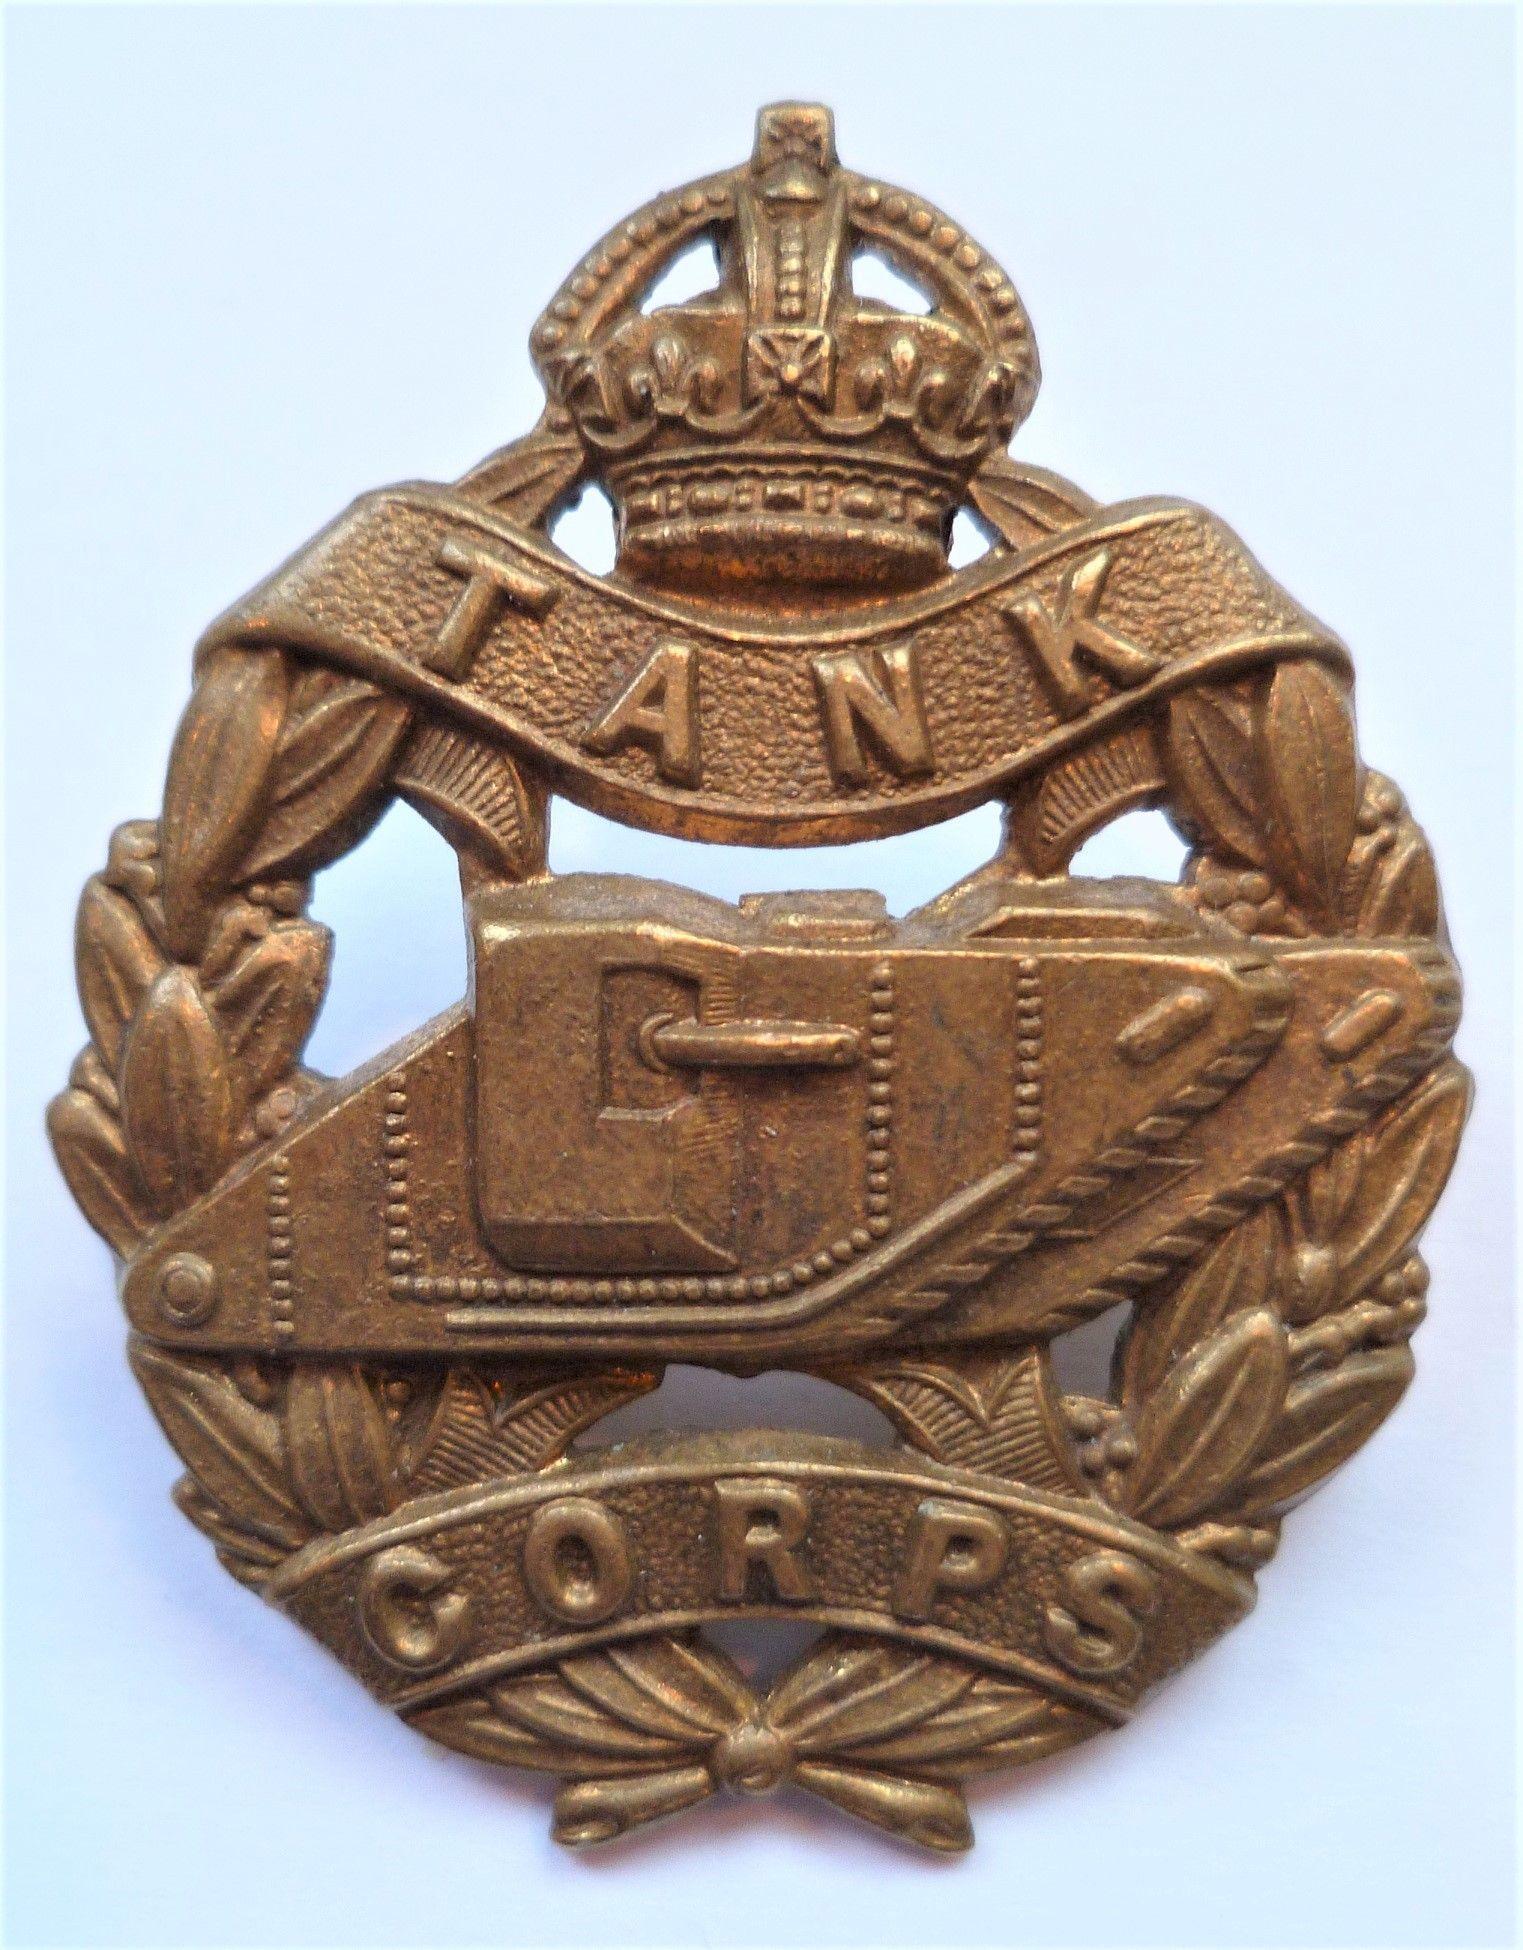 WW1 Tank Corps Cap Badge British Army British Army WWII